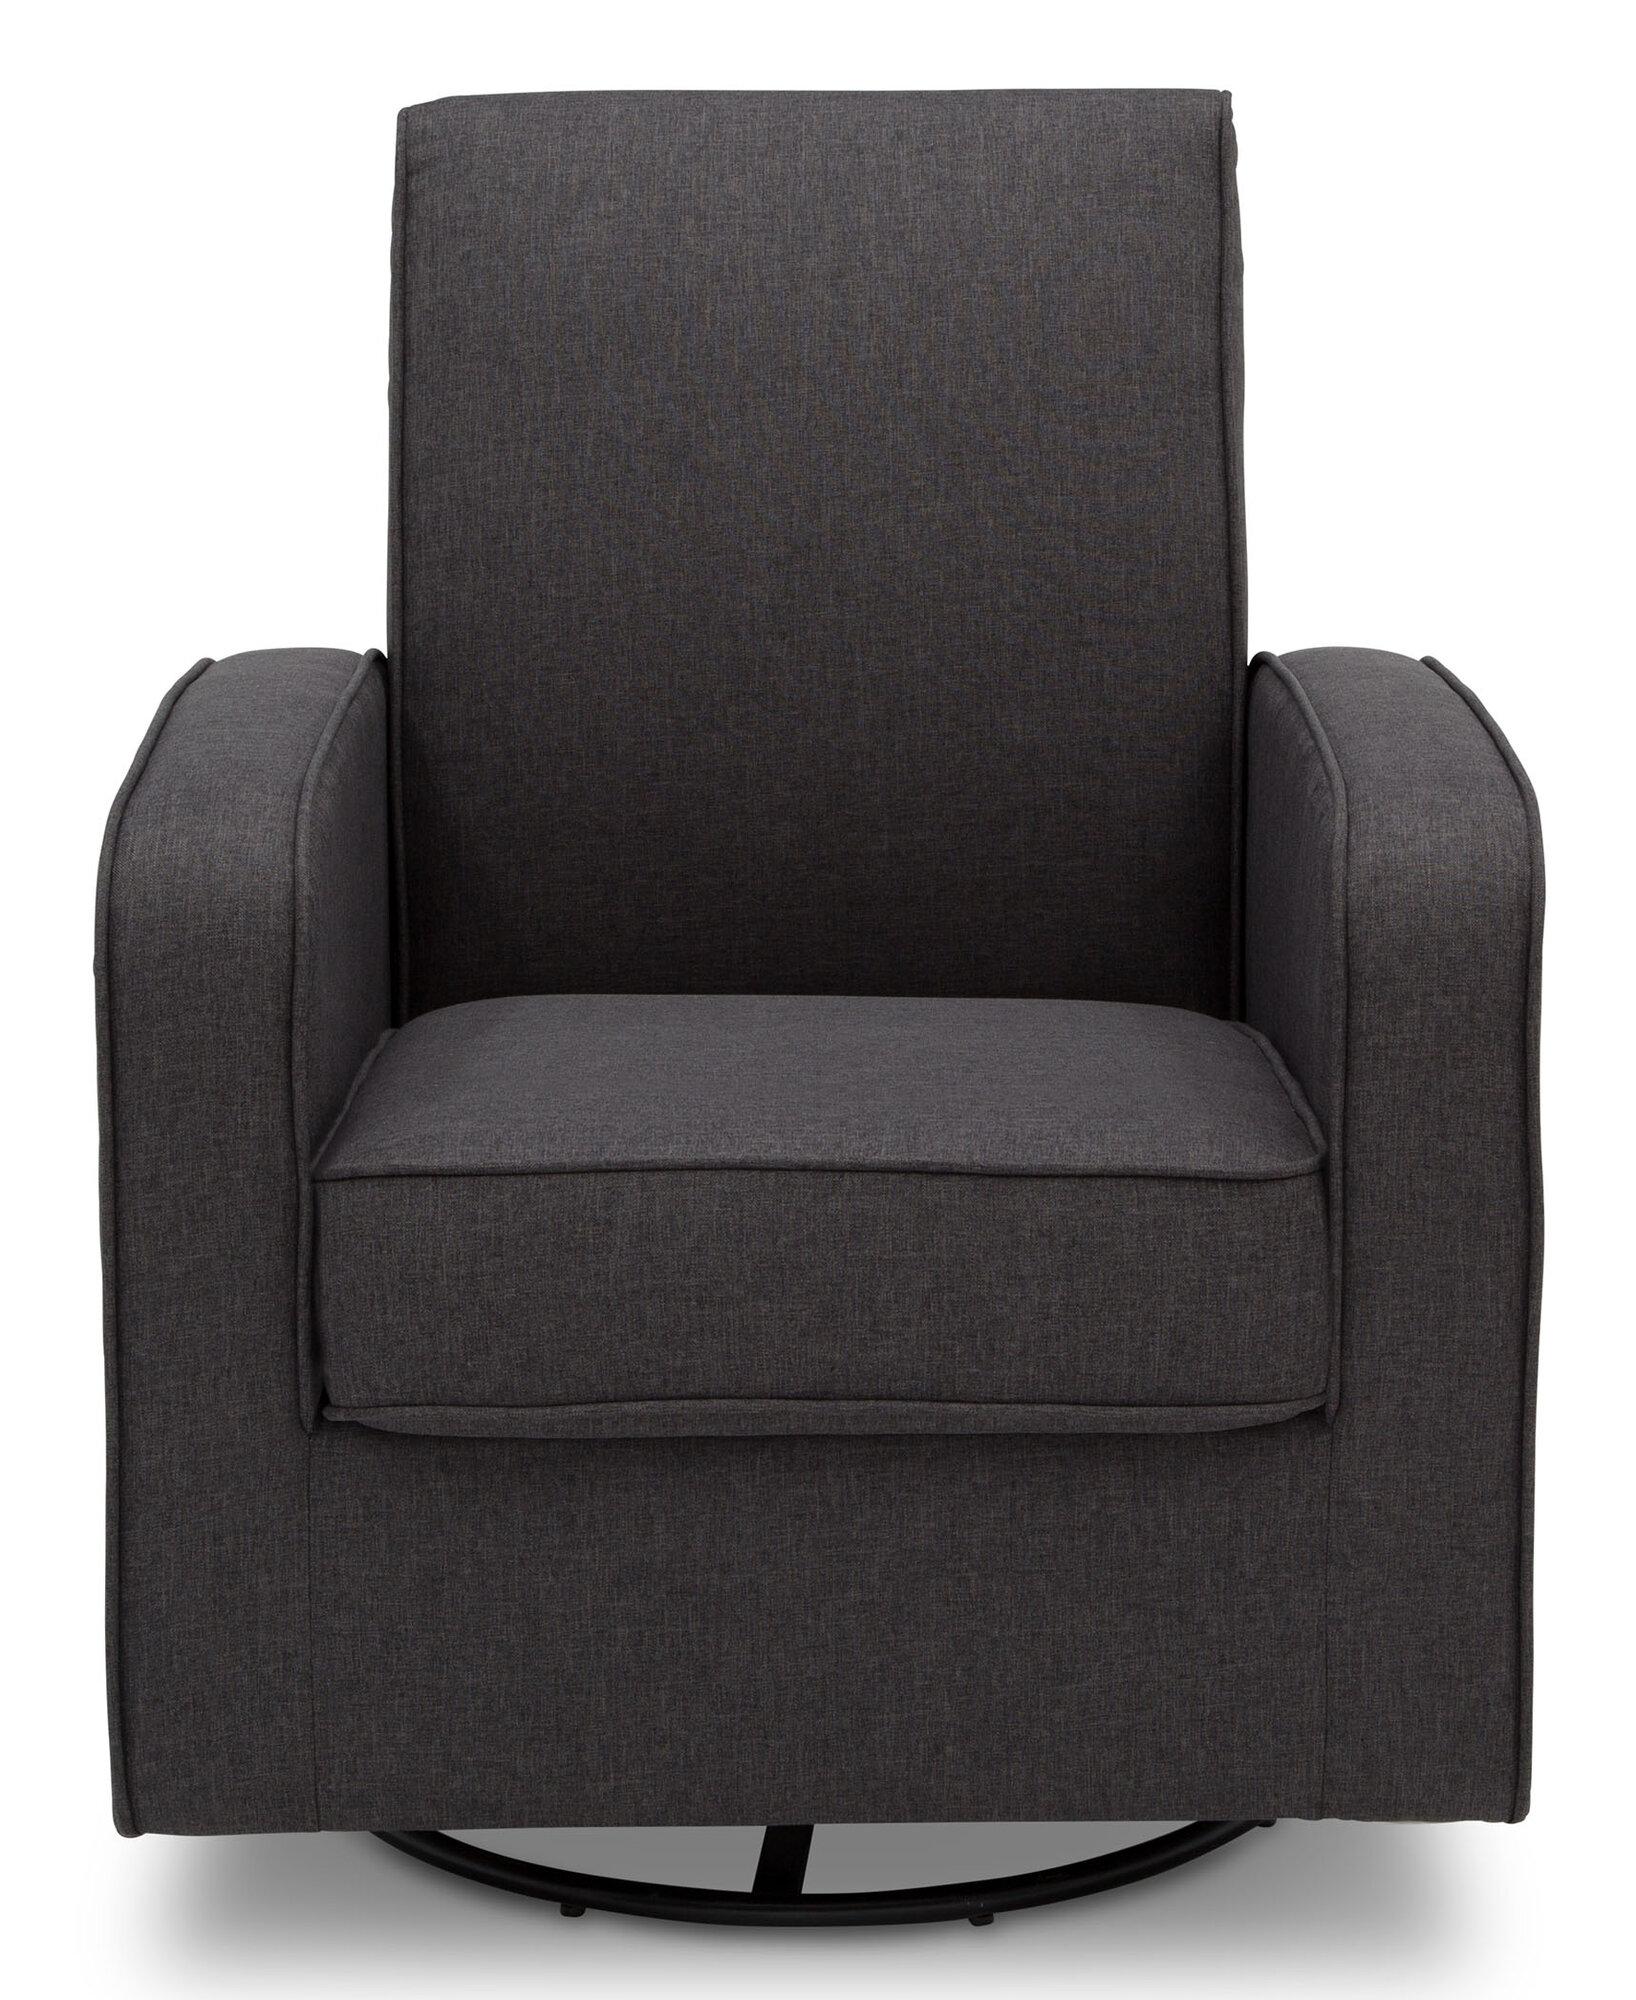 Delta Children Charlotte Nursery Glider Swivel Rocker Chair Charcoal